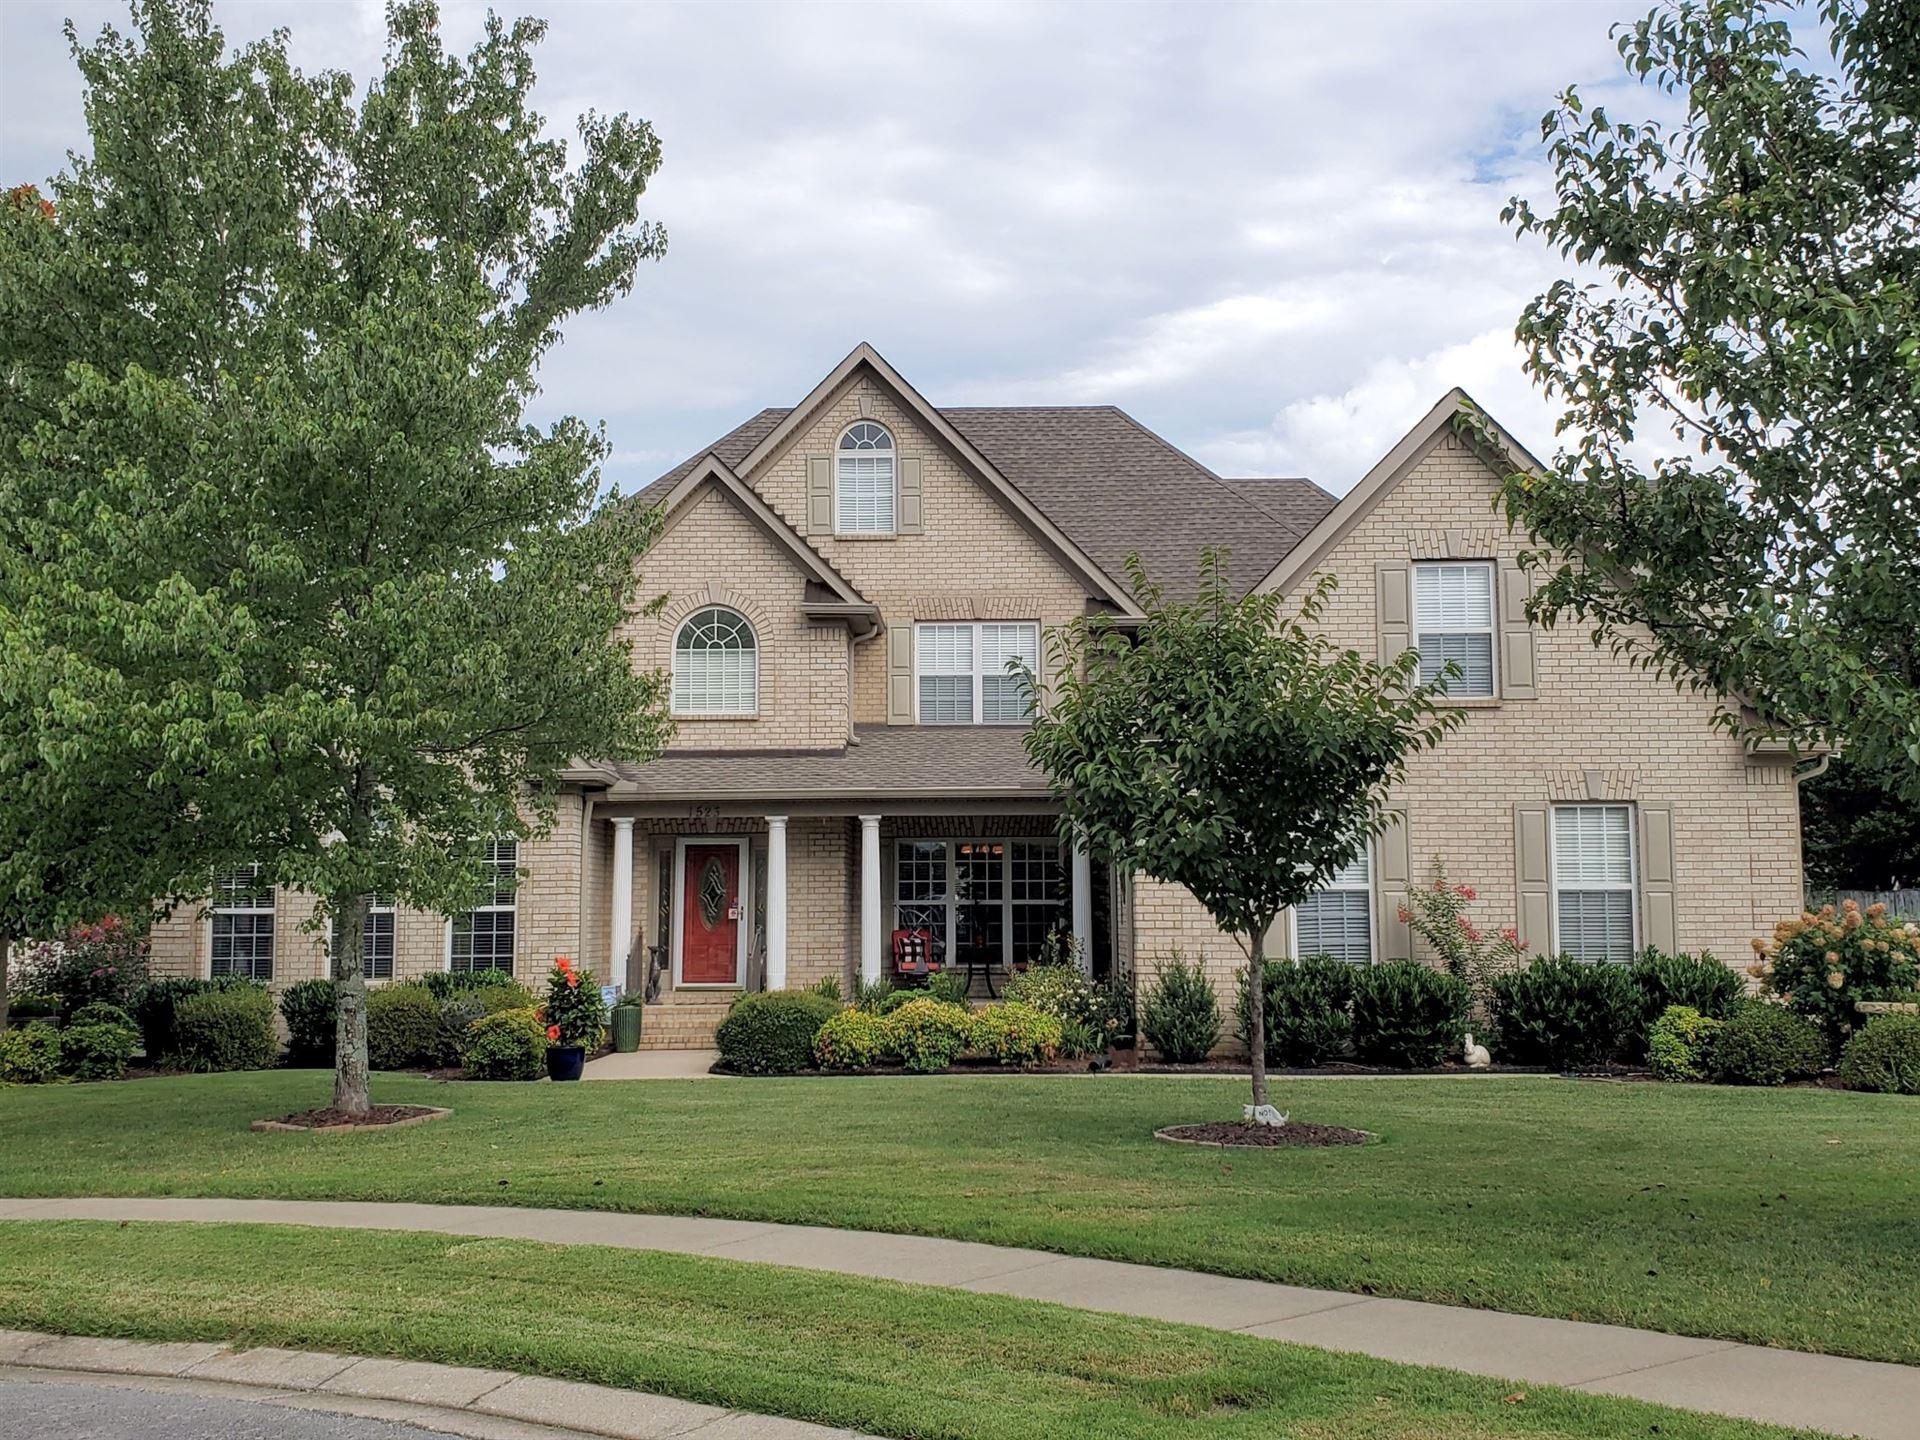 1523 Winterberry Dr, Murfreesboro, TN 37130 - MLS#: 2180085